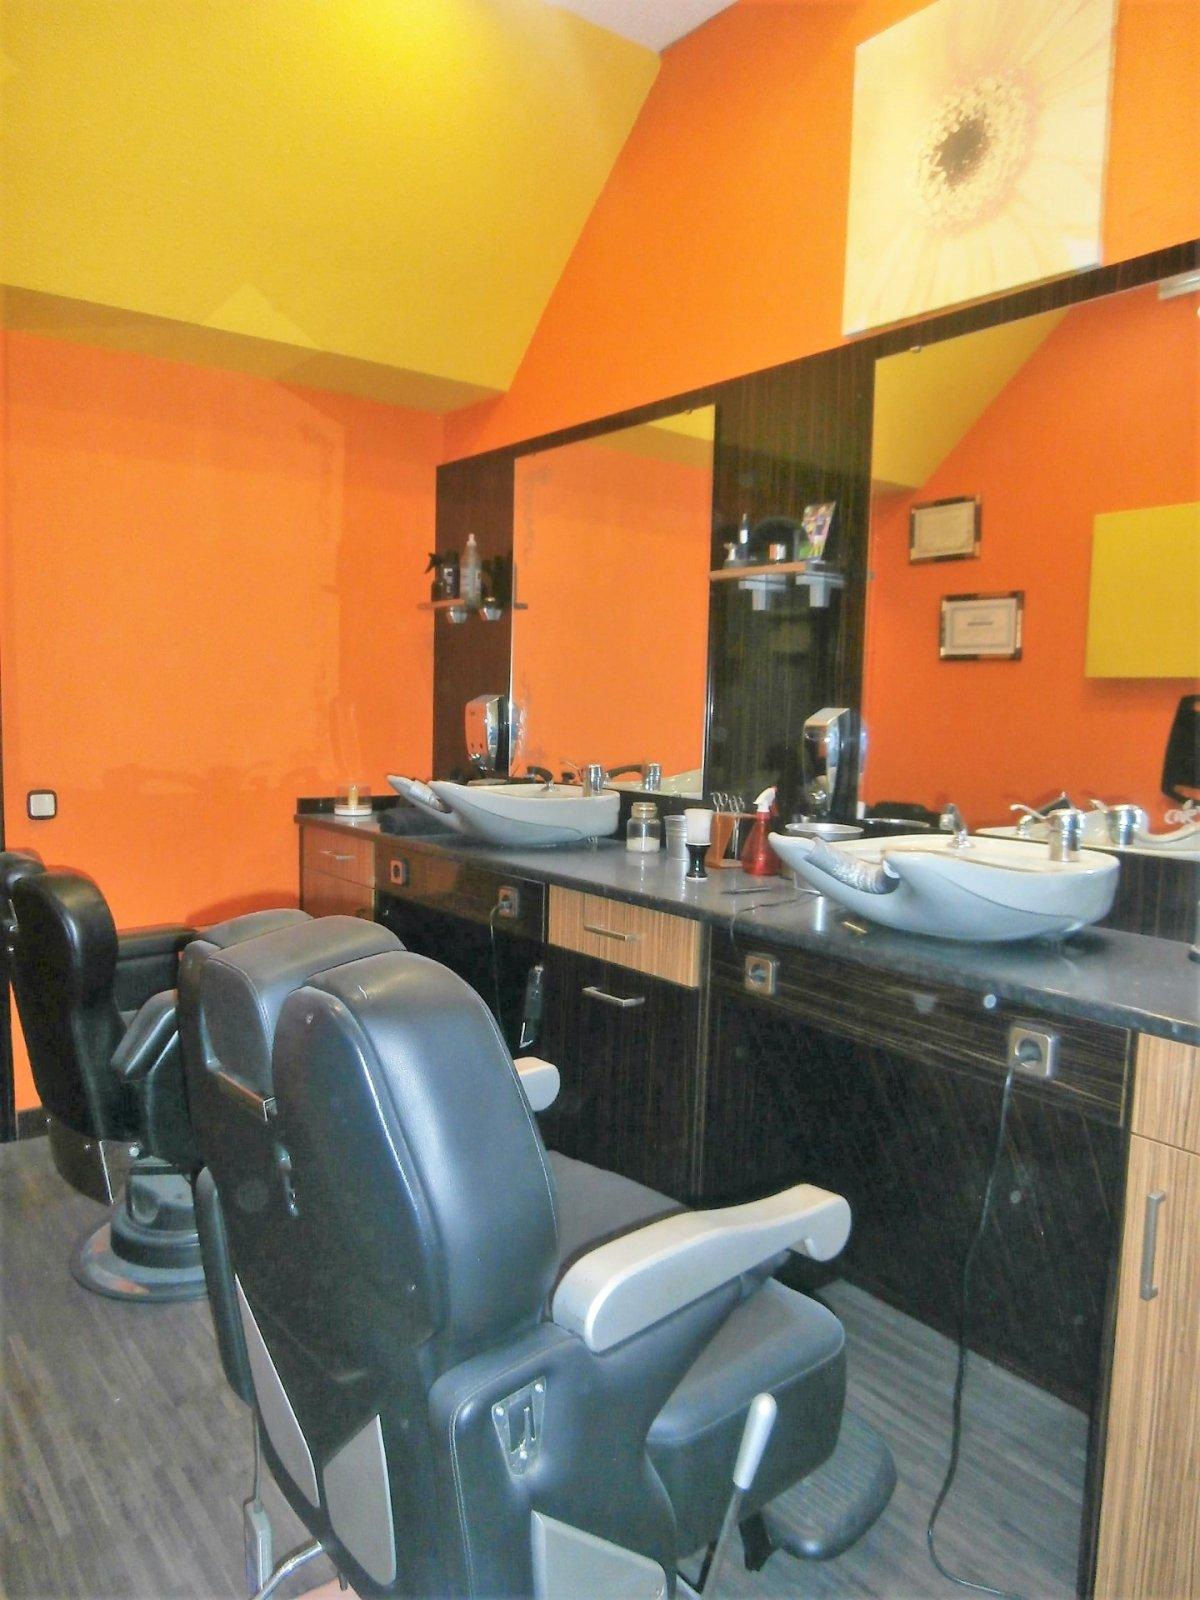 Local instalado como peluqueria - imagenInmueble1